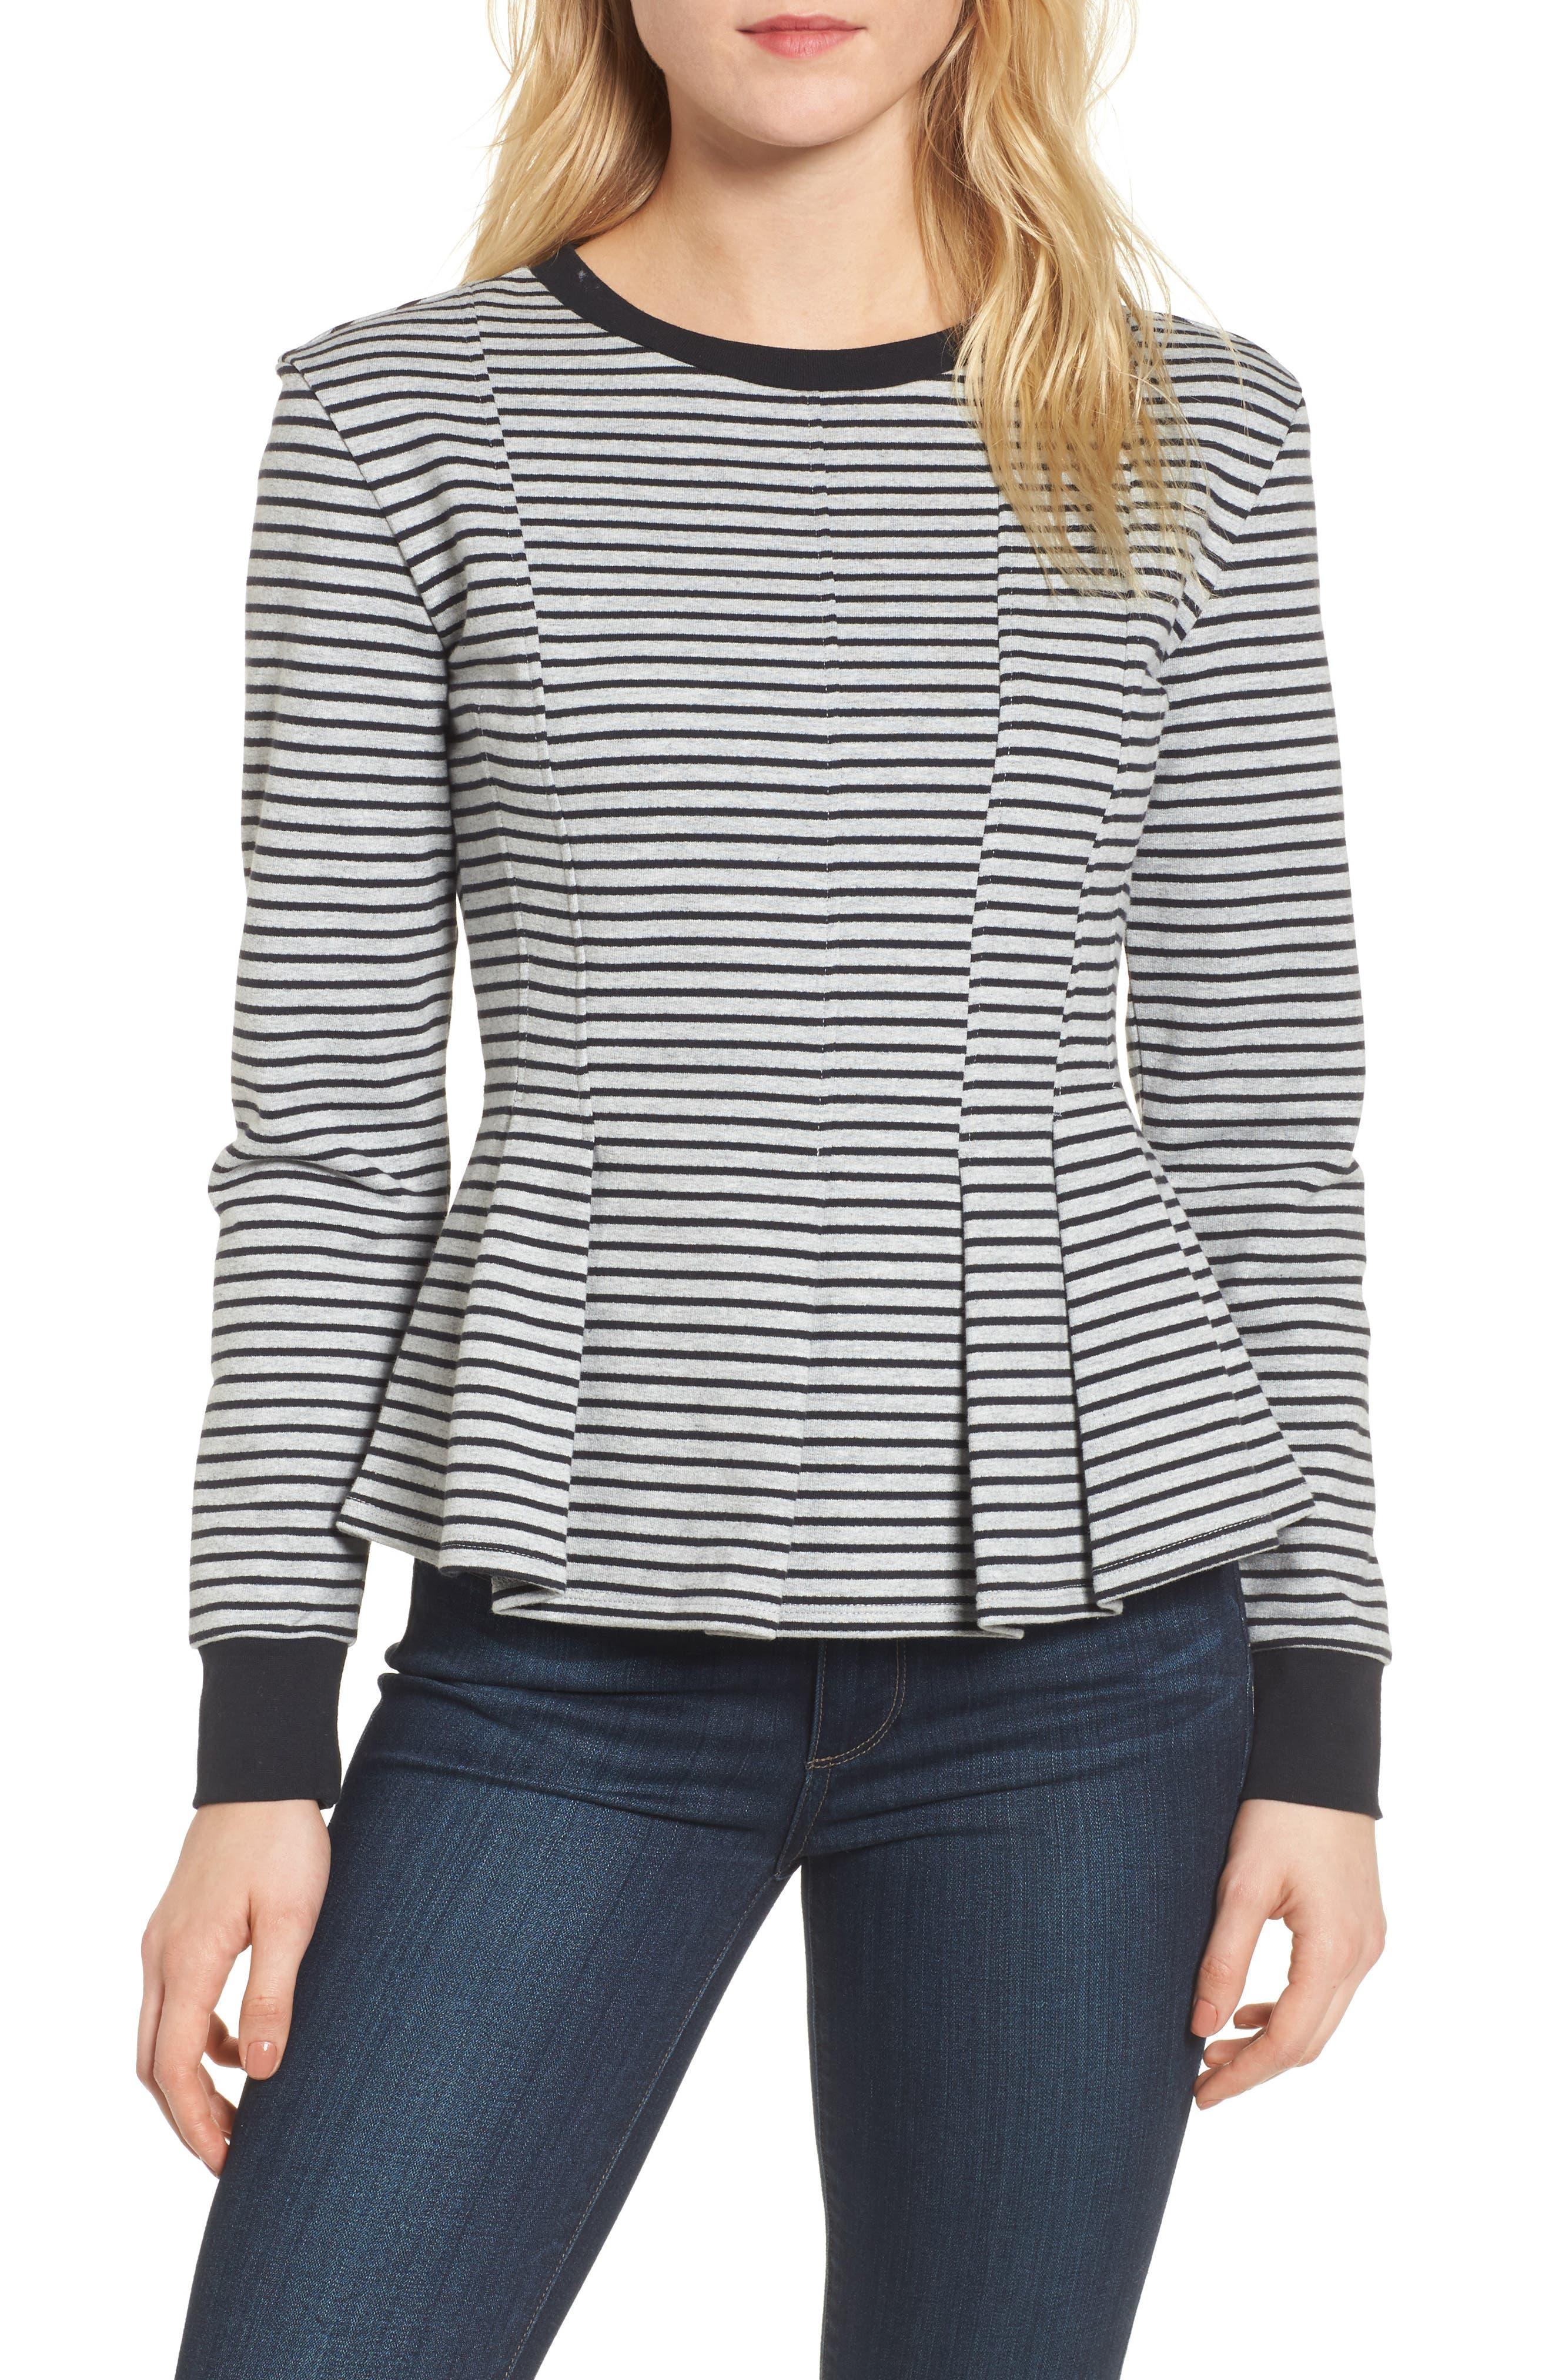 Pleated Sweatshirt,                             Main thumbnail 1, color,                             Grey Heather- Navy Seam Stripe